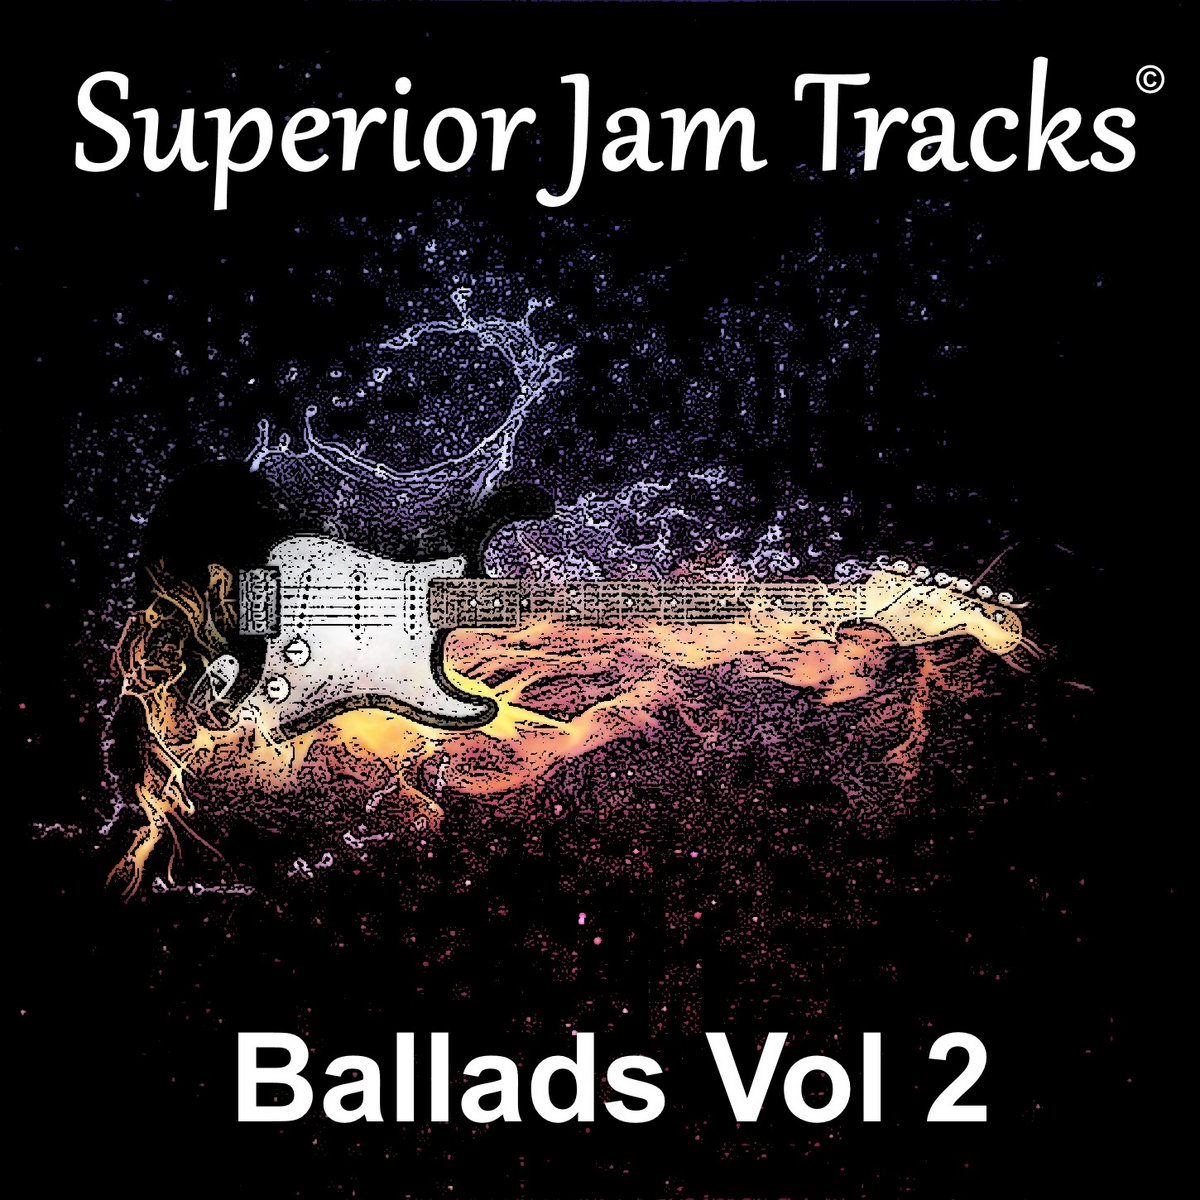 Guitar Backing Tracks Ballads Vol 2 + Scales PDF | Superior